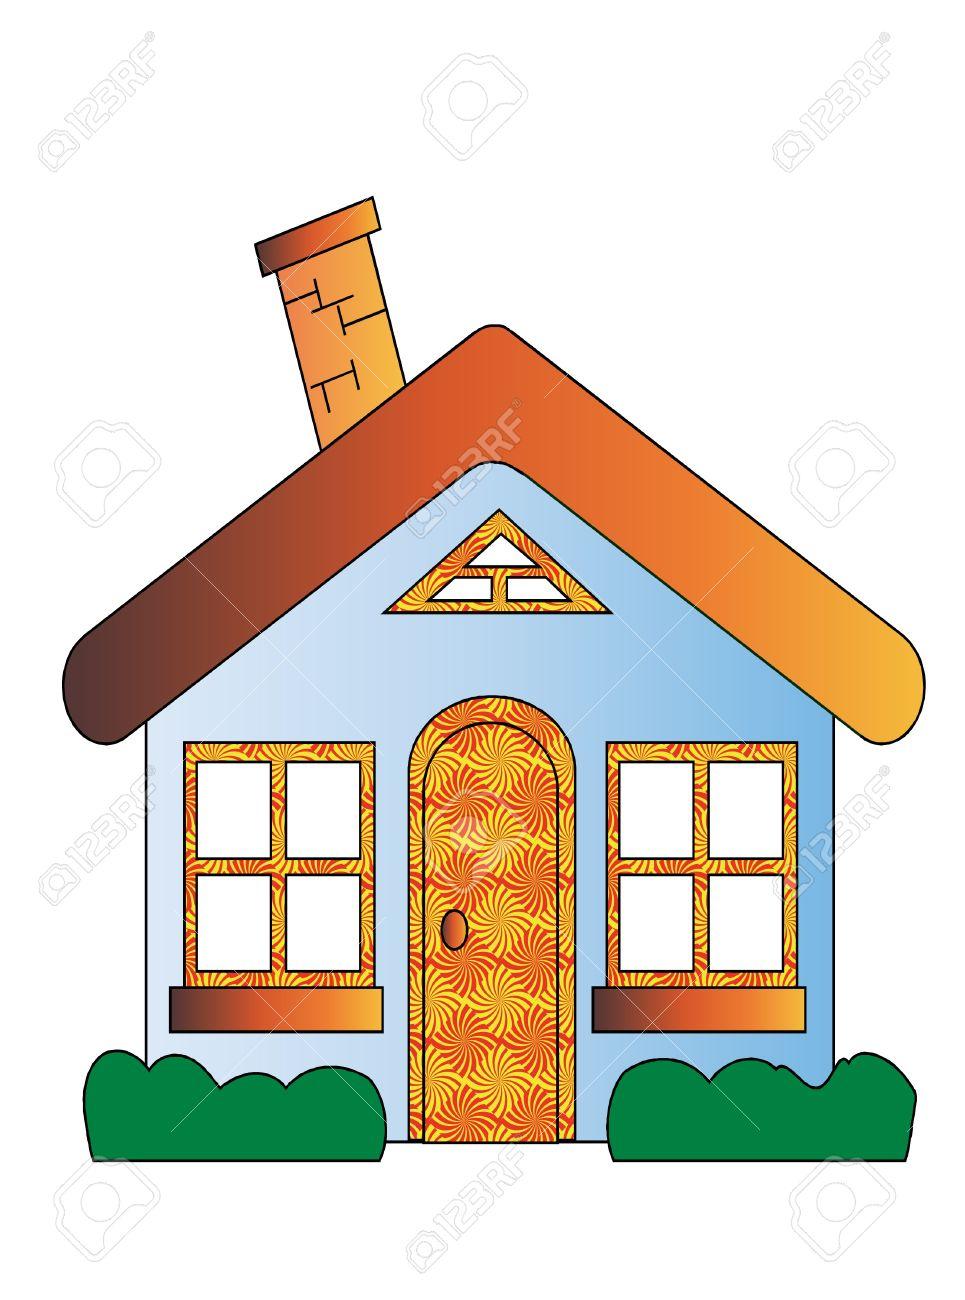 House Cartoon Royalty Free Cliparts, Vectors, And Stock ...